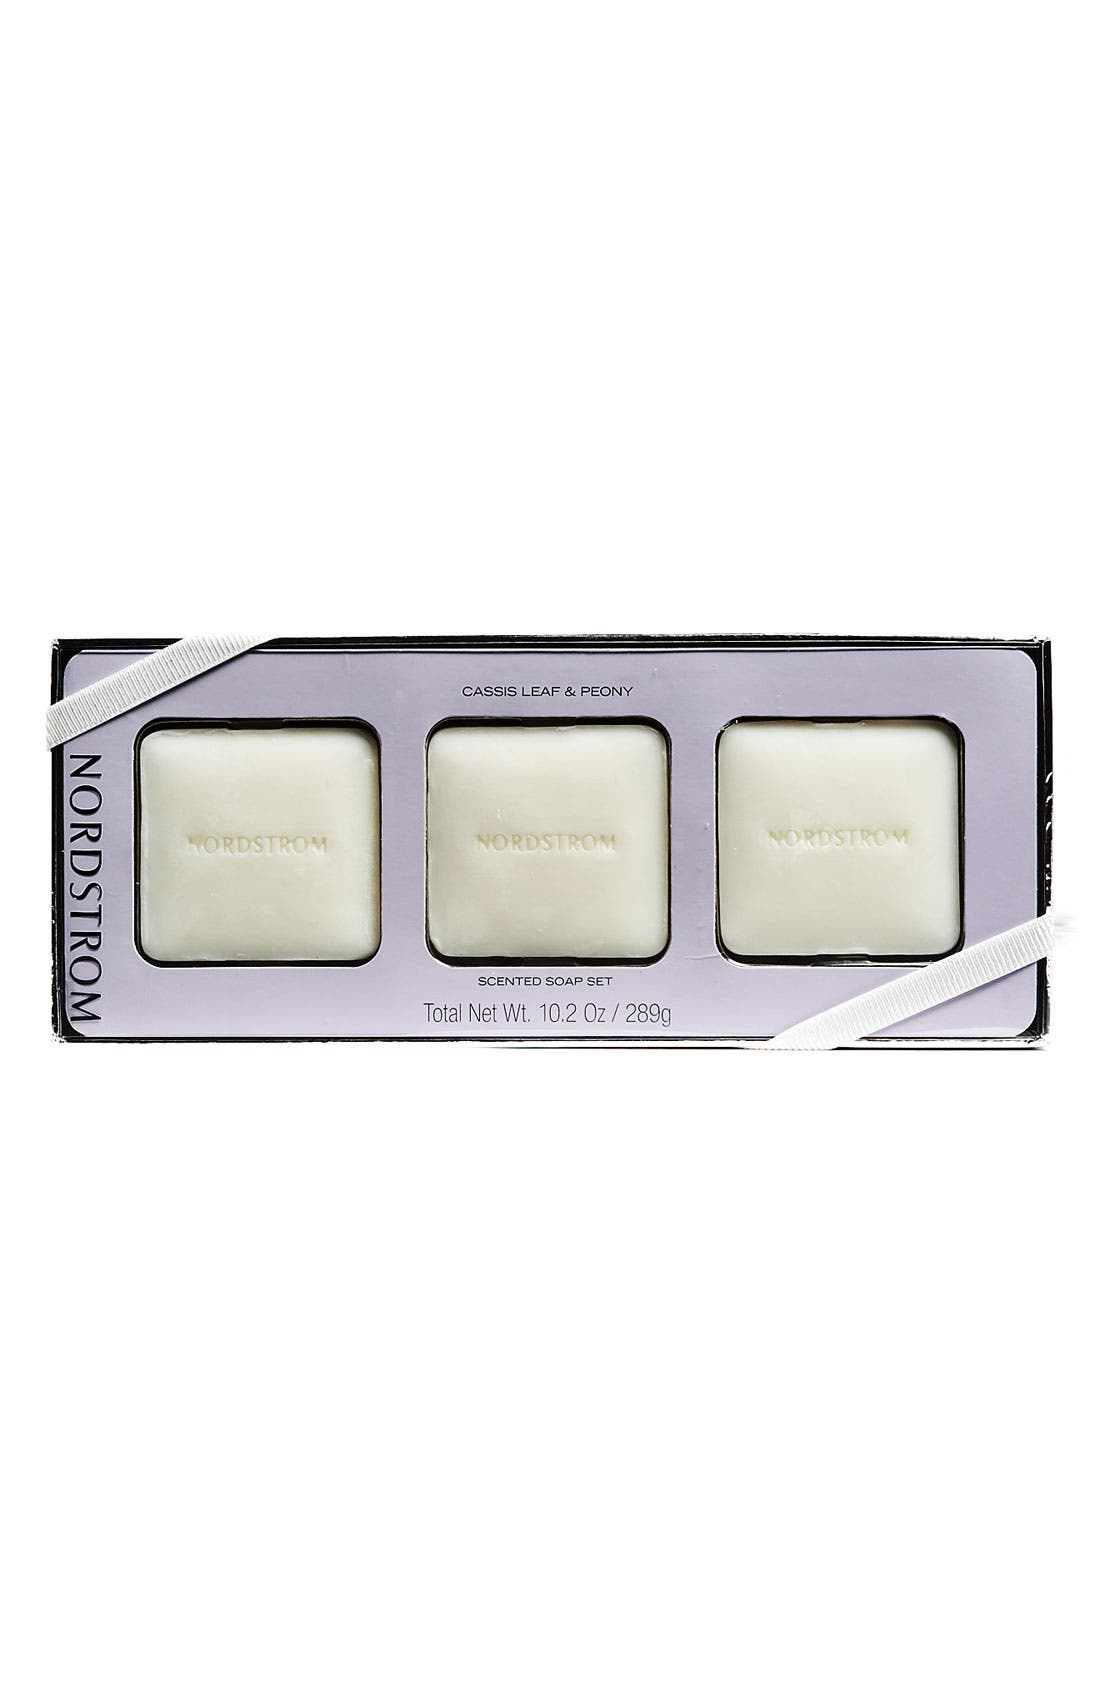 Alternate Image 1 Selected - Nordstrom 'Cassis Leaf & Peony' Scented Soap Set